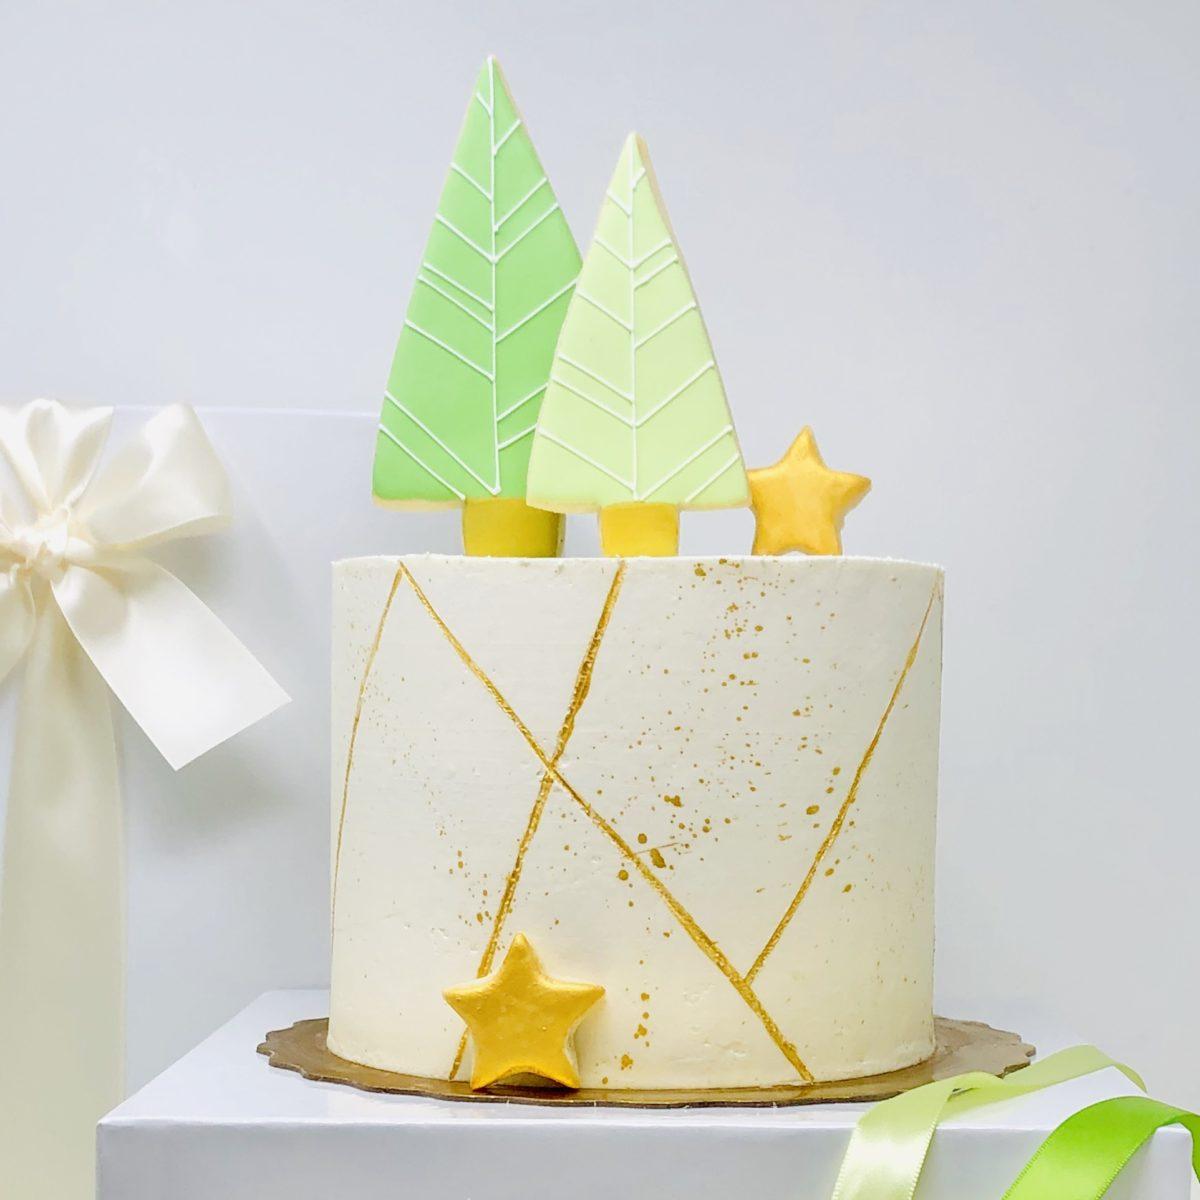 Luxe Christmas Cake